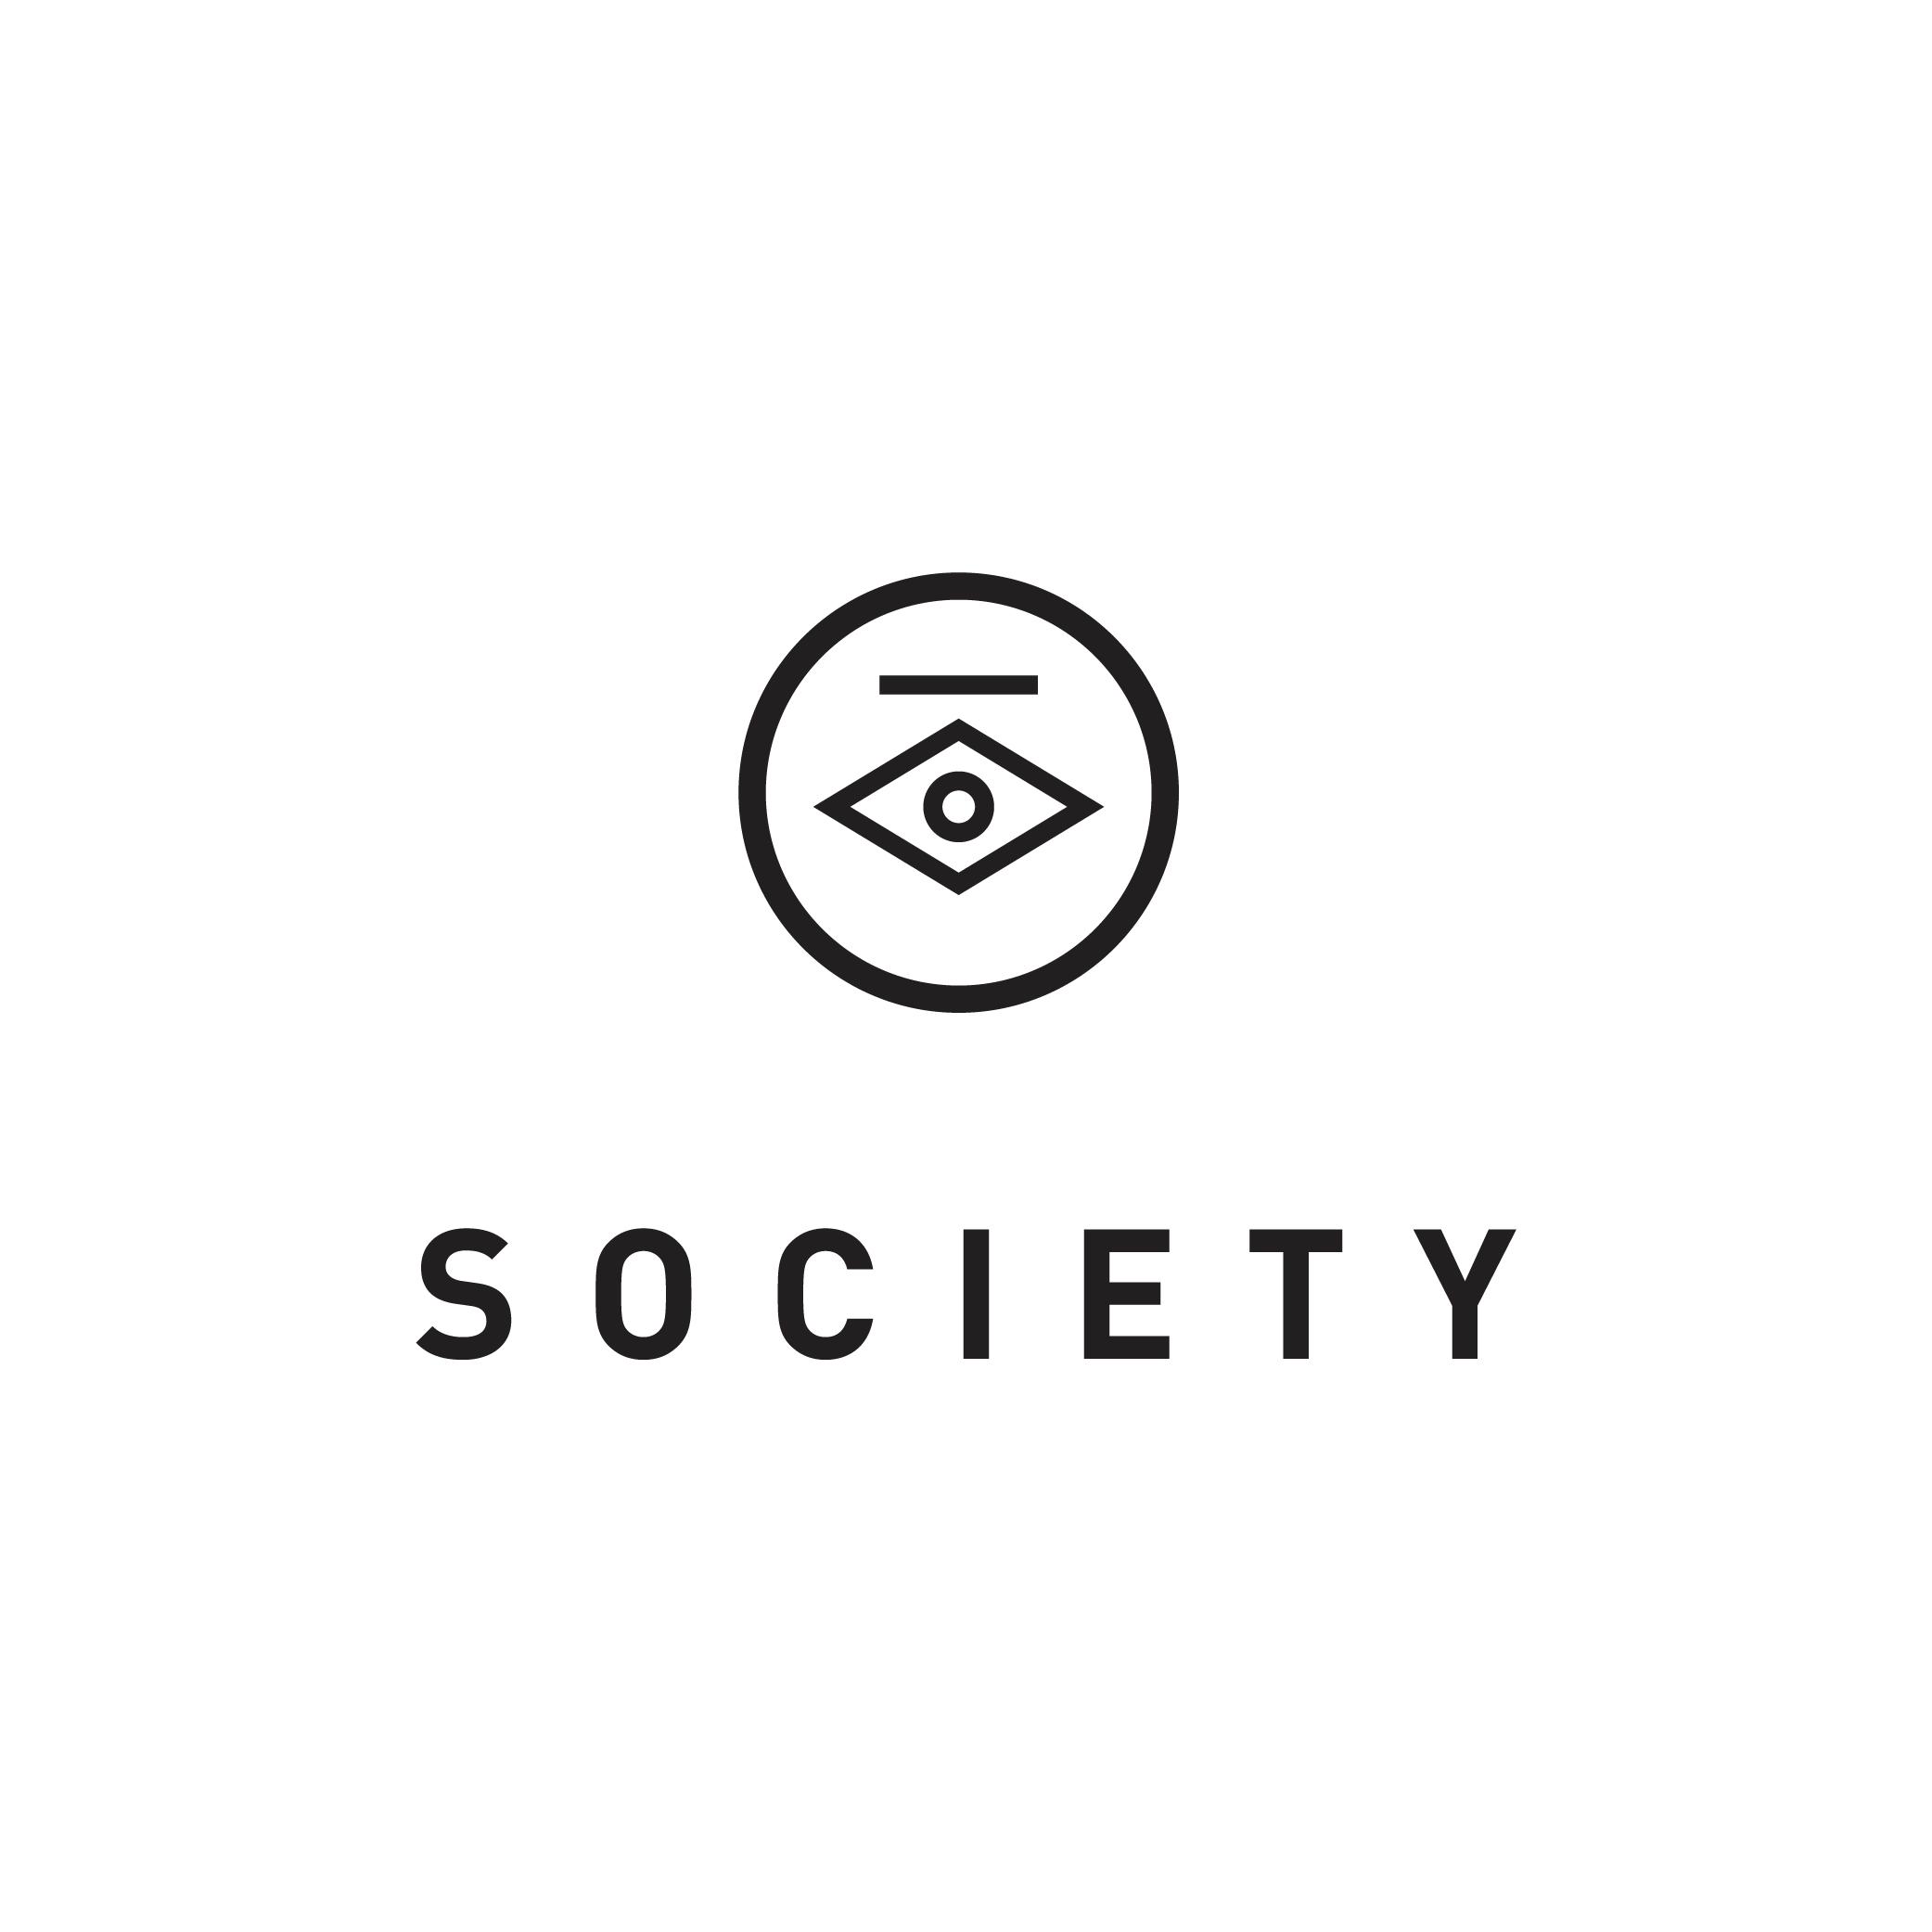 SOCIETY_Logo_SquareLockUp_White.jpg